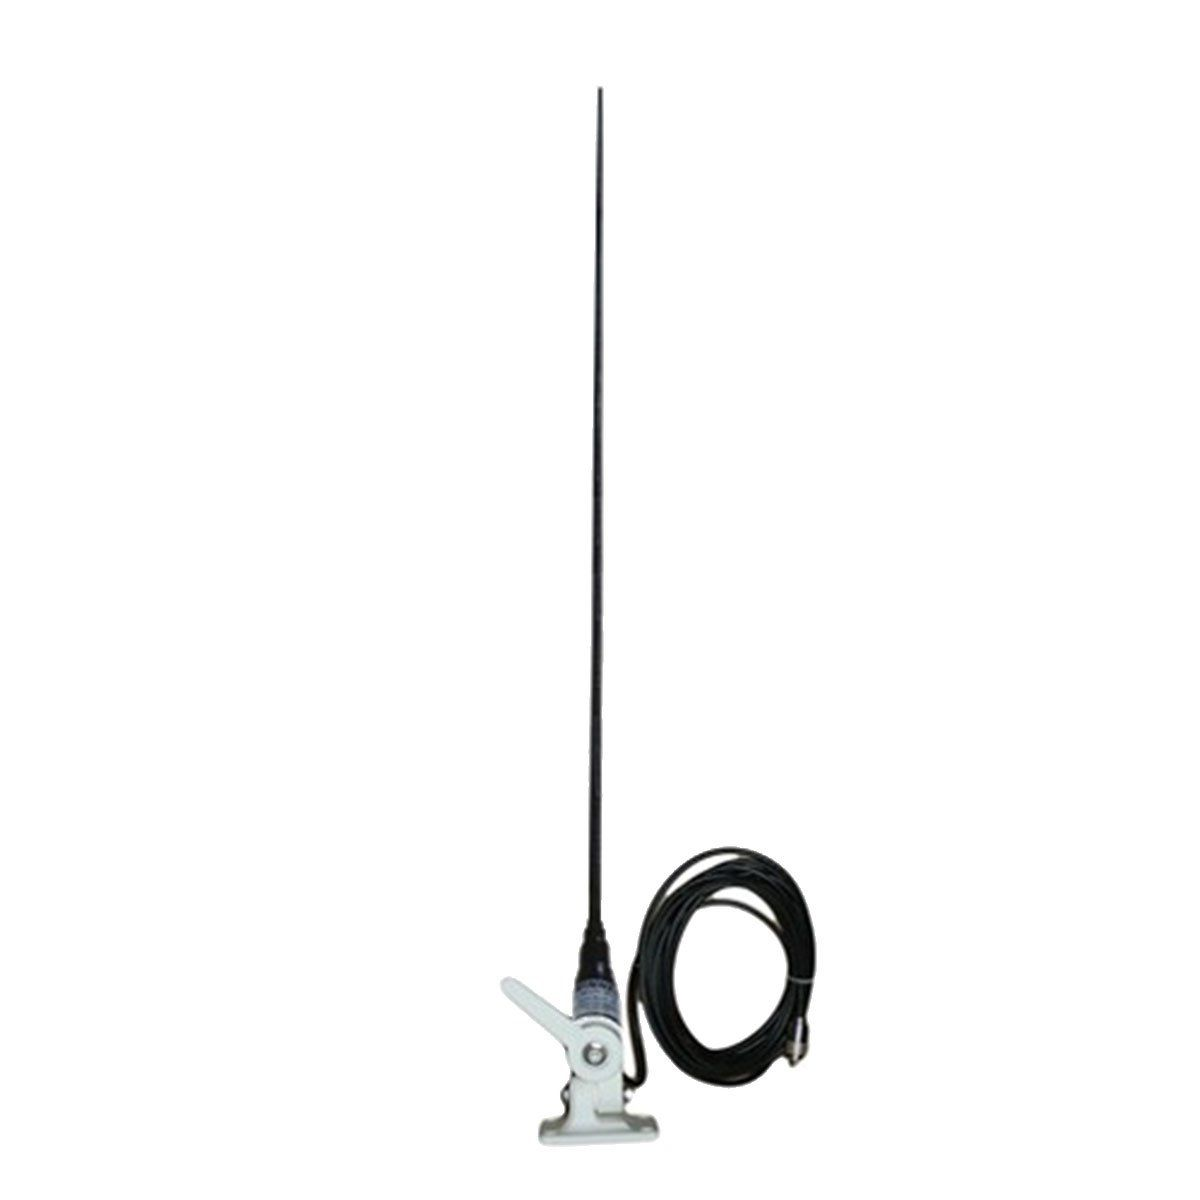 Antena VHF -9 DBI Preta